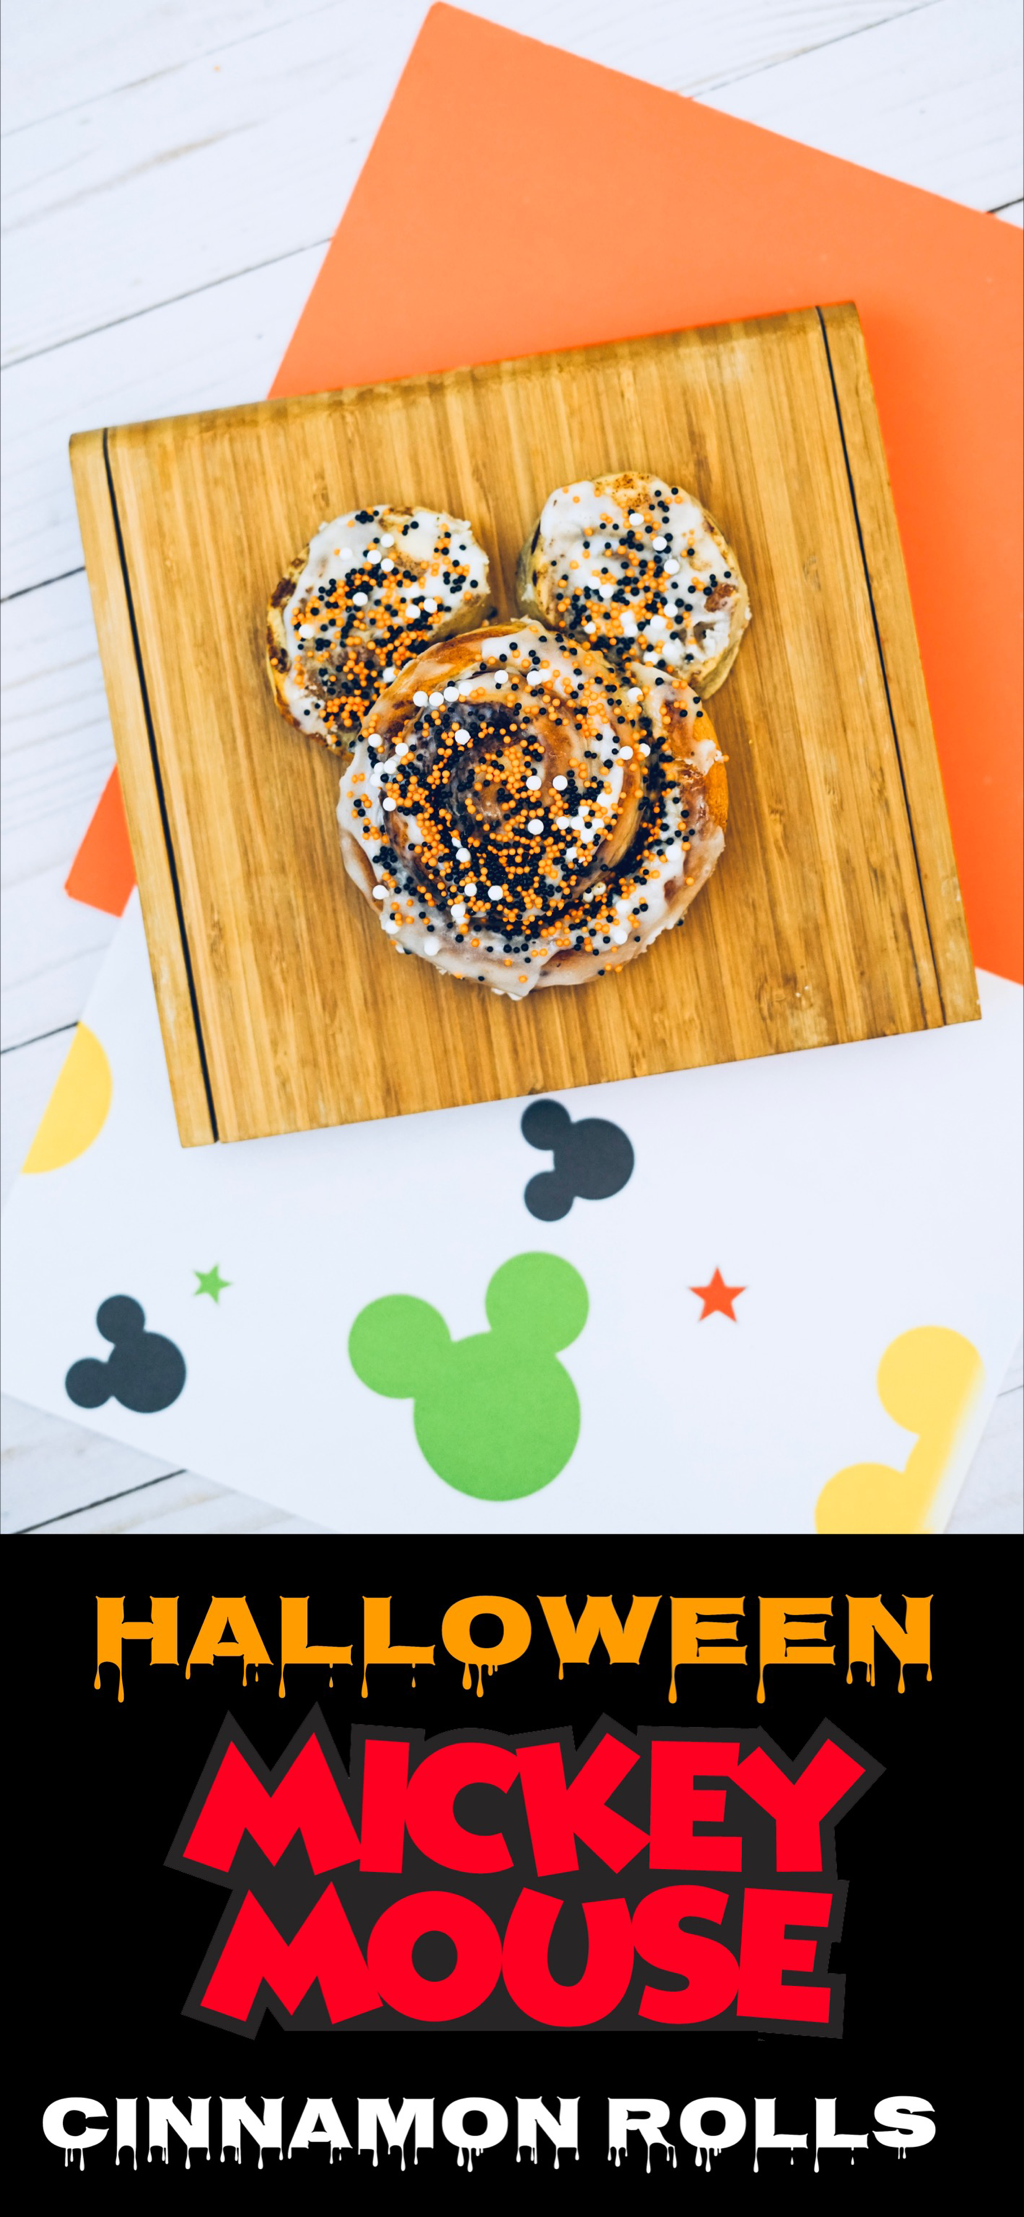 Mickey Mouse Cinnamon Rolls Cinnamon rolls, Halloween